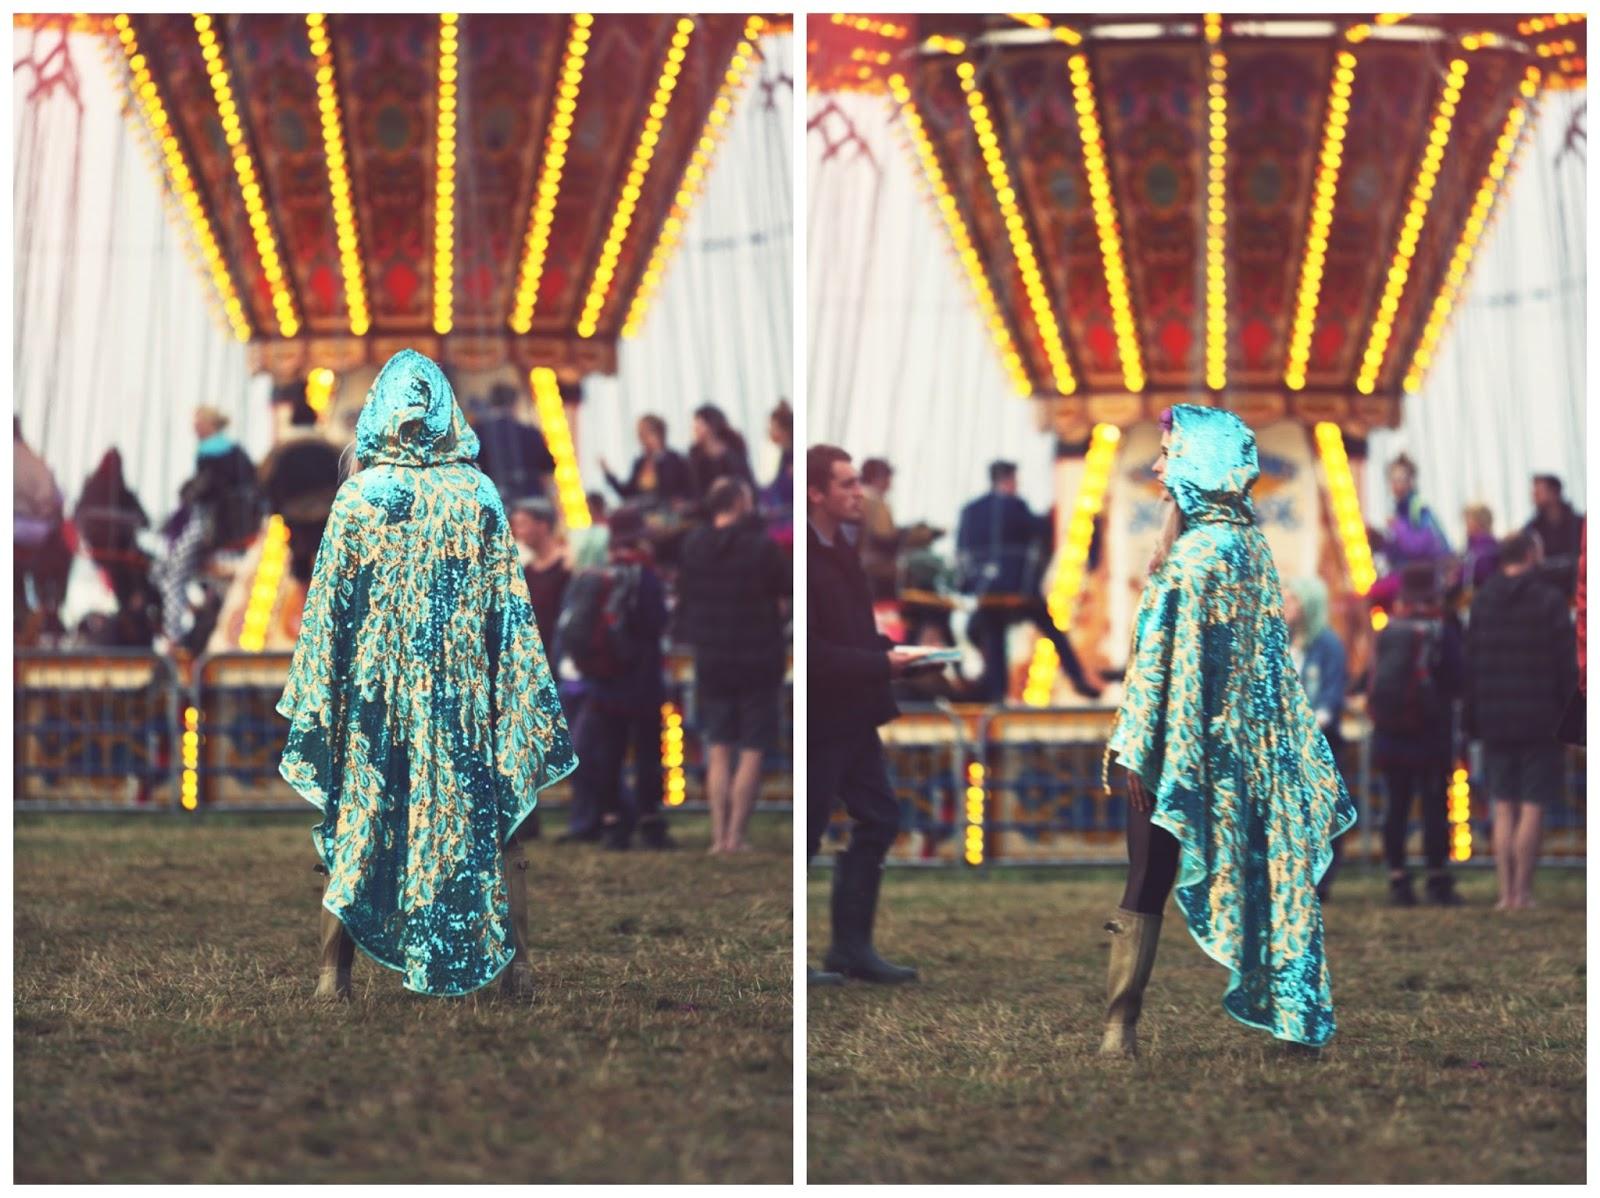 festival cape, puckoo couture, capes capes capes, sequin cape, Shambala festival, festival style,